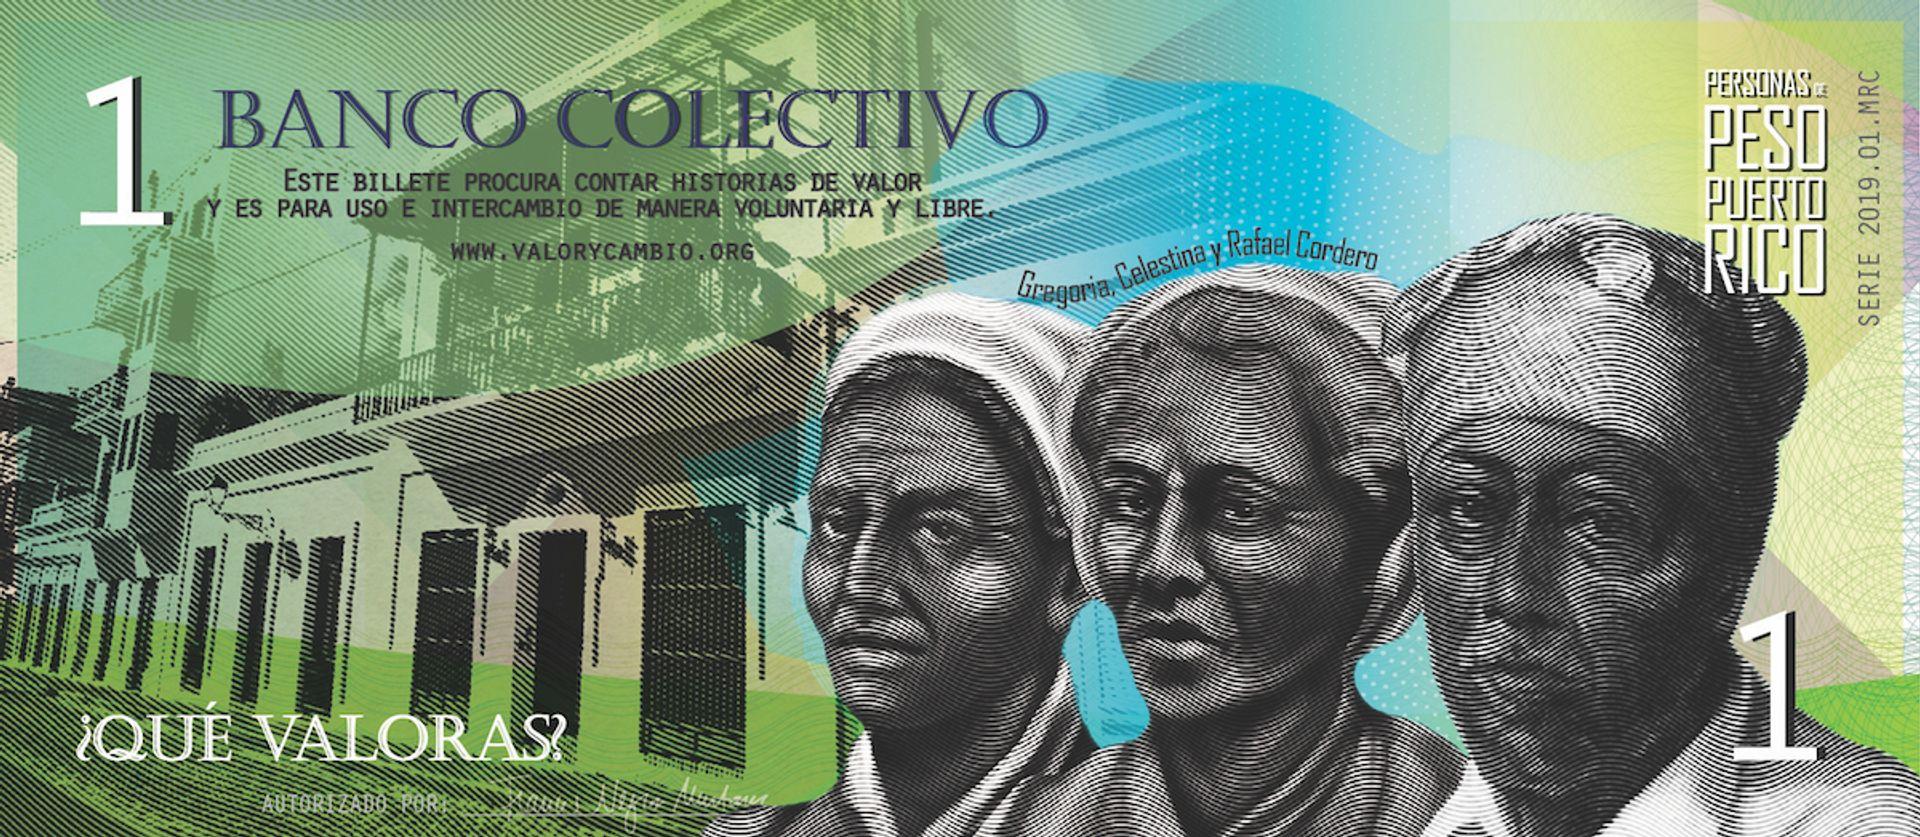 Banco Colectivo Frances Negrón-Muntaner and Sarabel Santos-Negrón